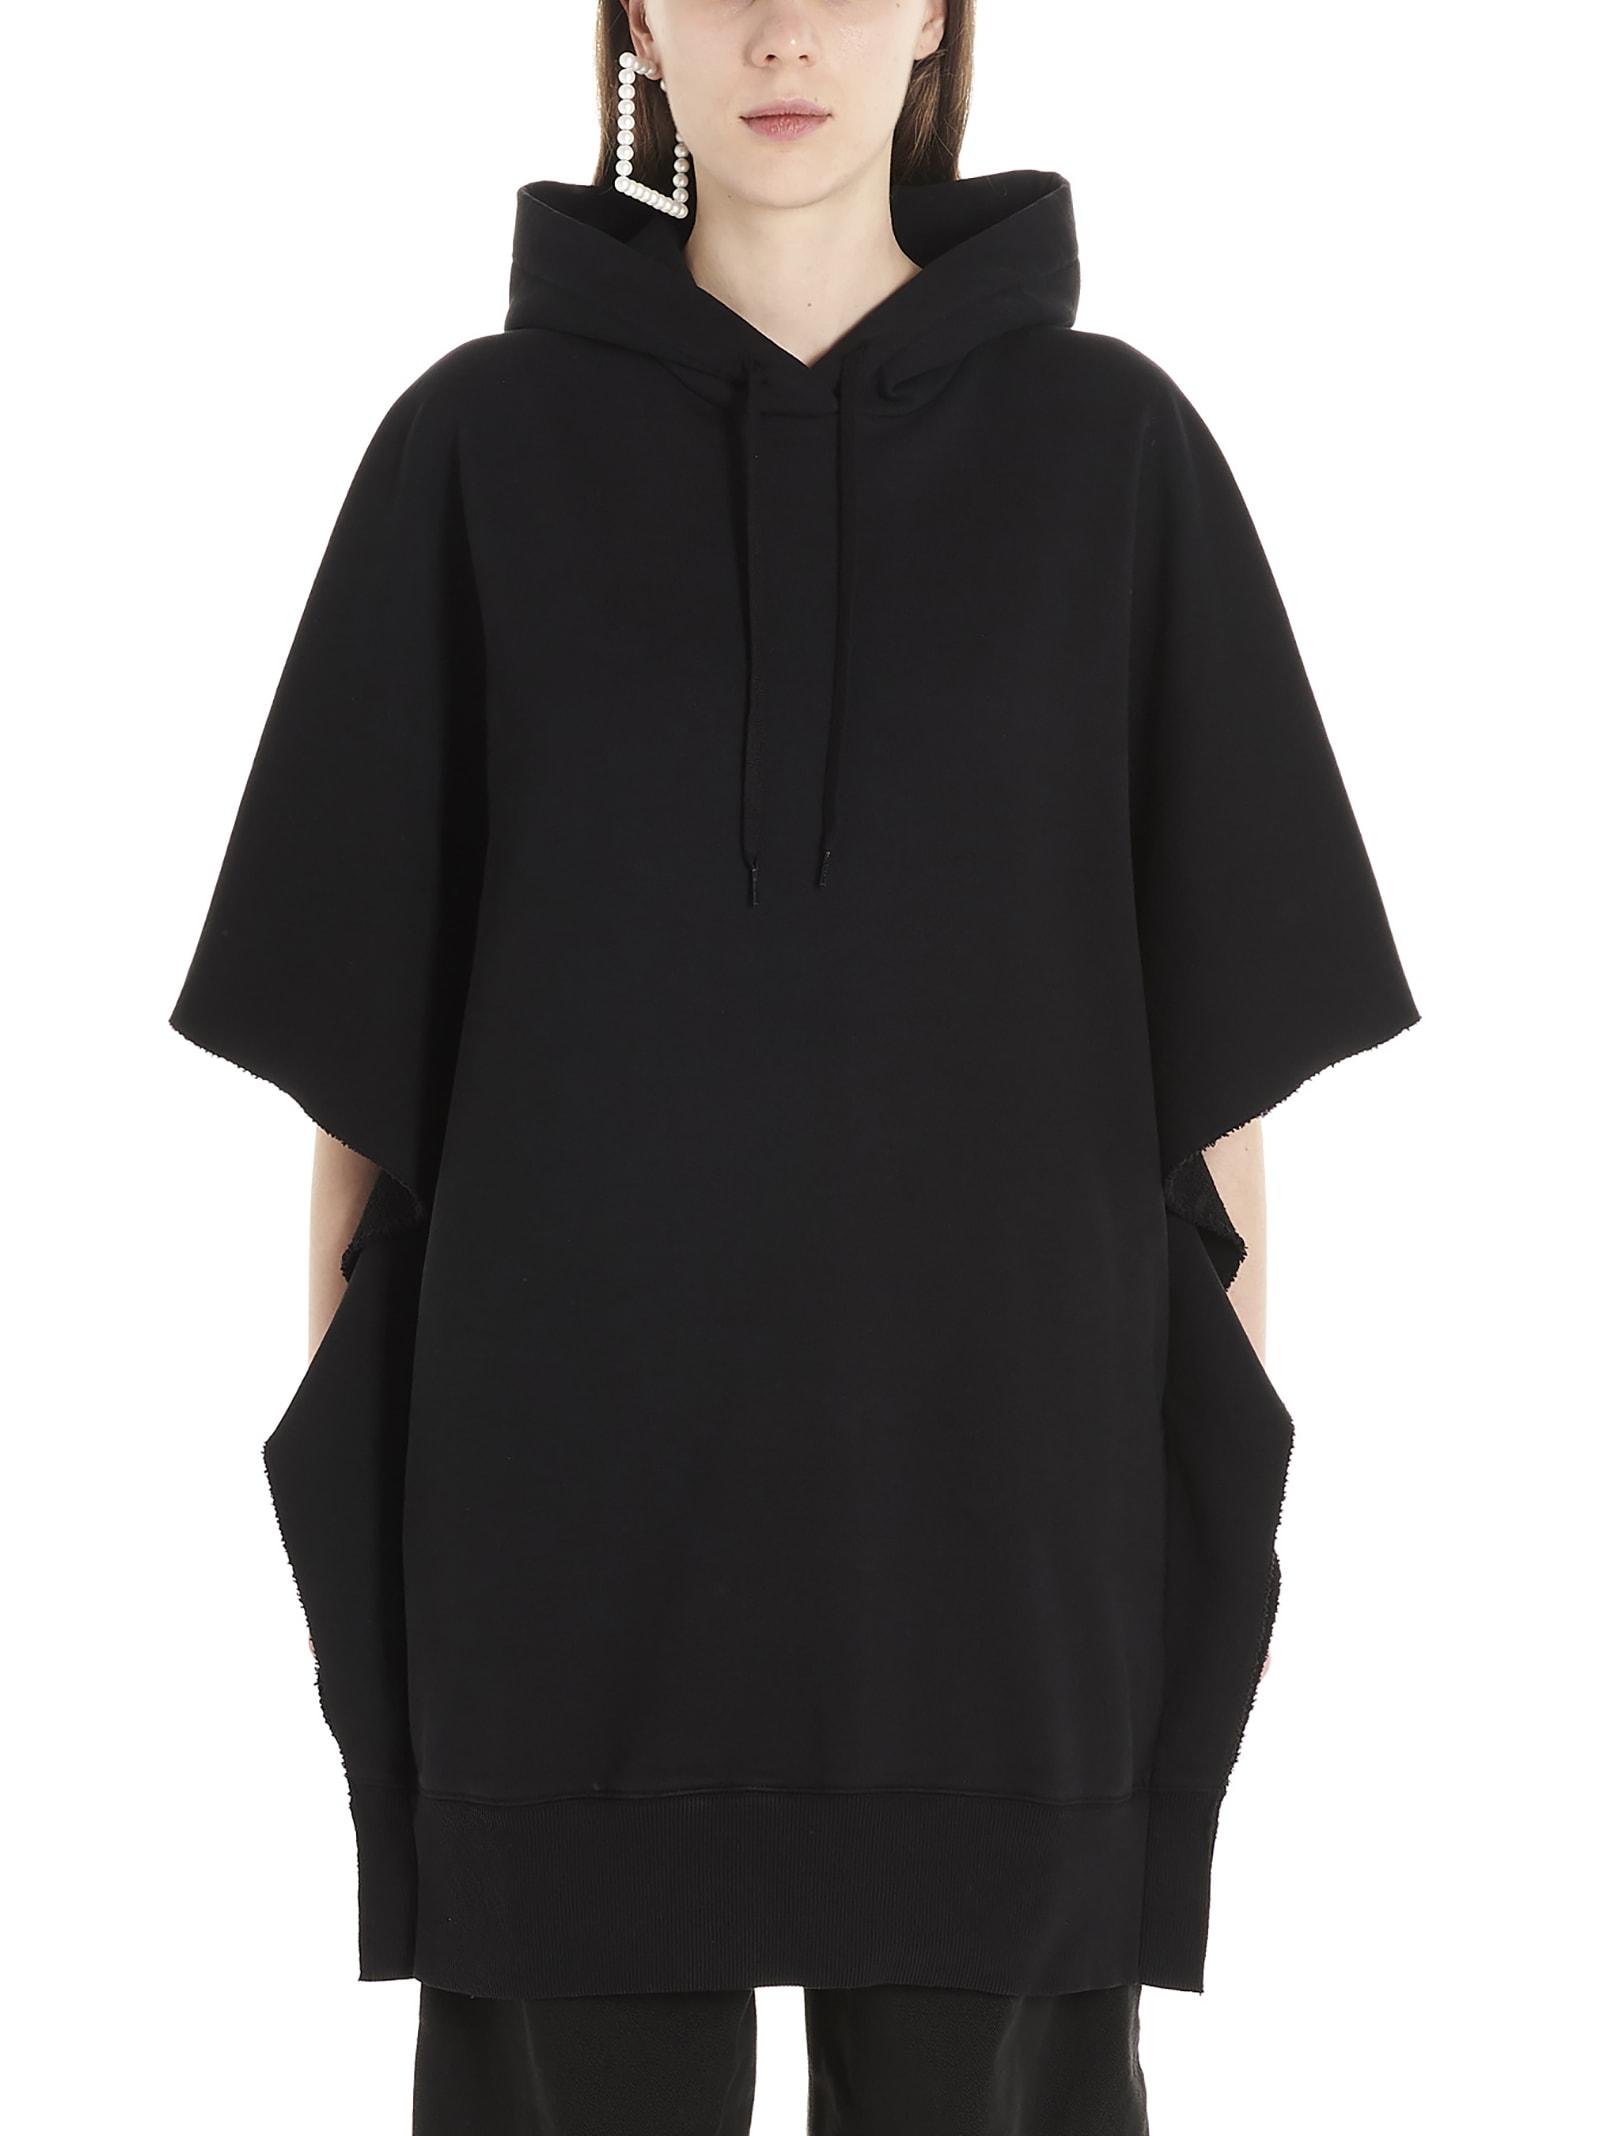 Buy Mm6 Maison Margiela Hood Dress online, shop MM6 Maison Margiela with free shipping